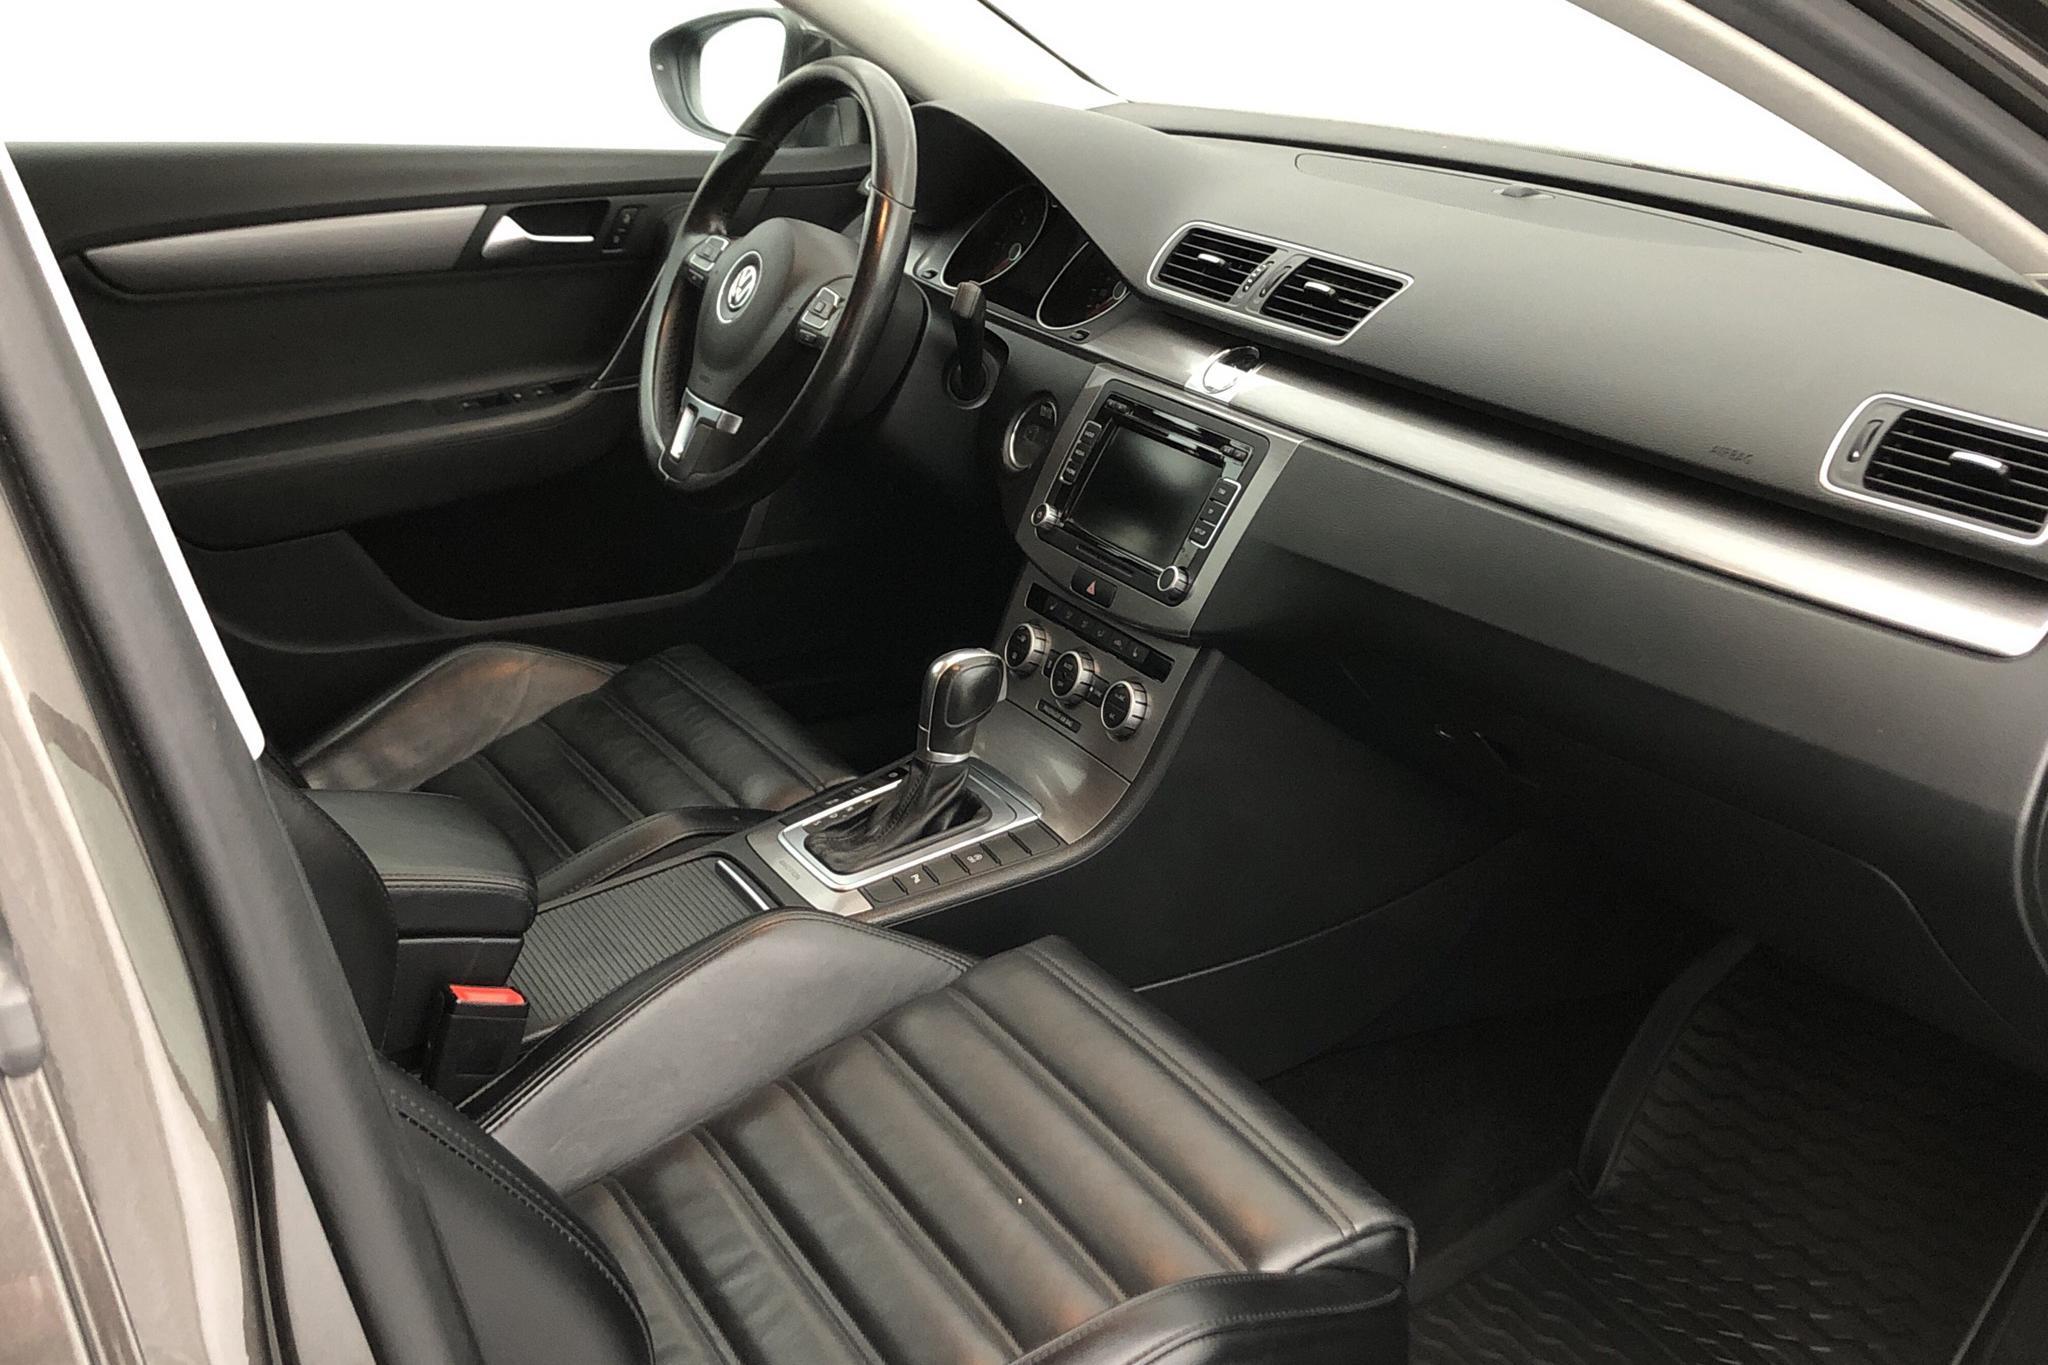 VW Passat 2.0 TDI BlueMotion Technology Variant 4Motion (177hk) - 15 655 mil - Automat - Dark Brown - 2015